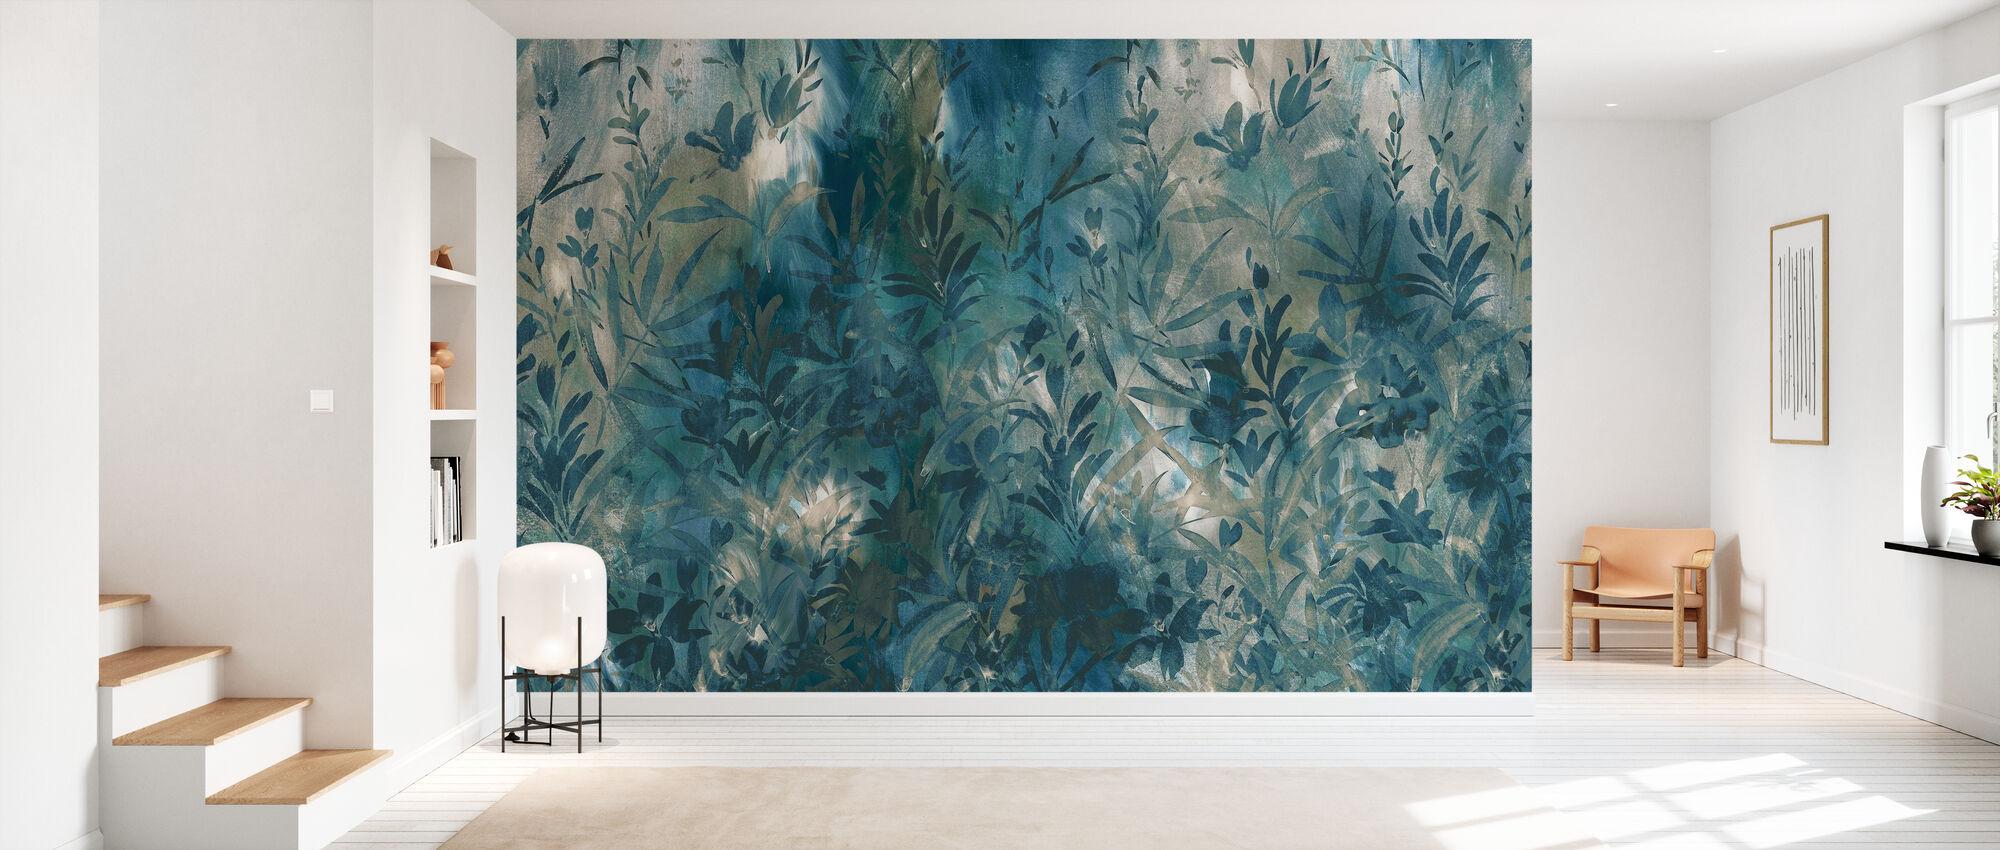 Herbage - Wallpaper - Hallway